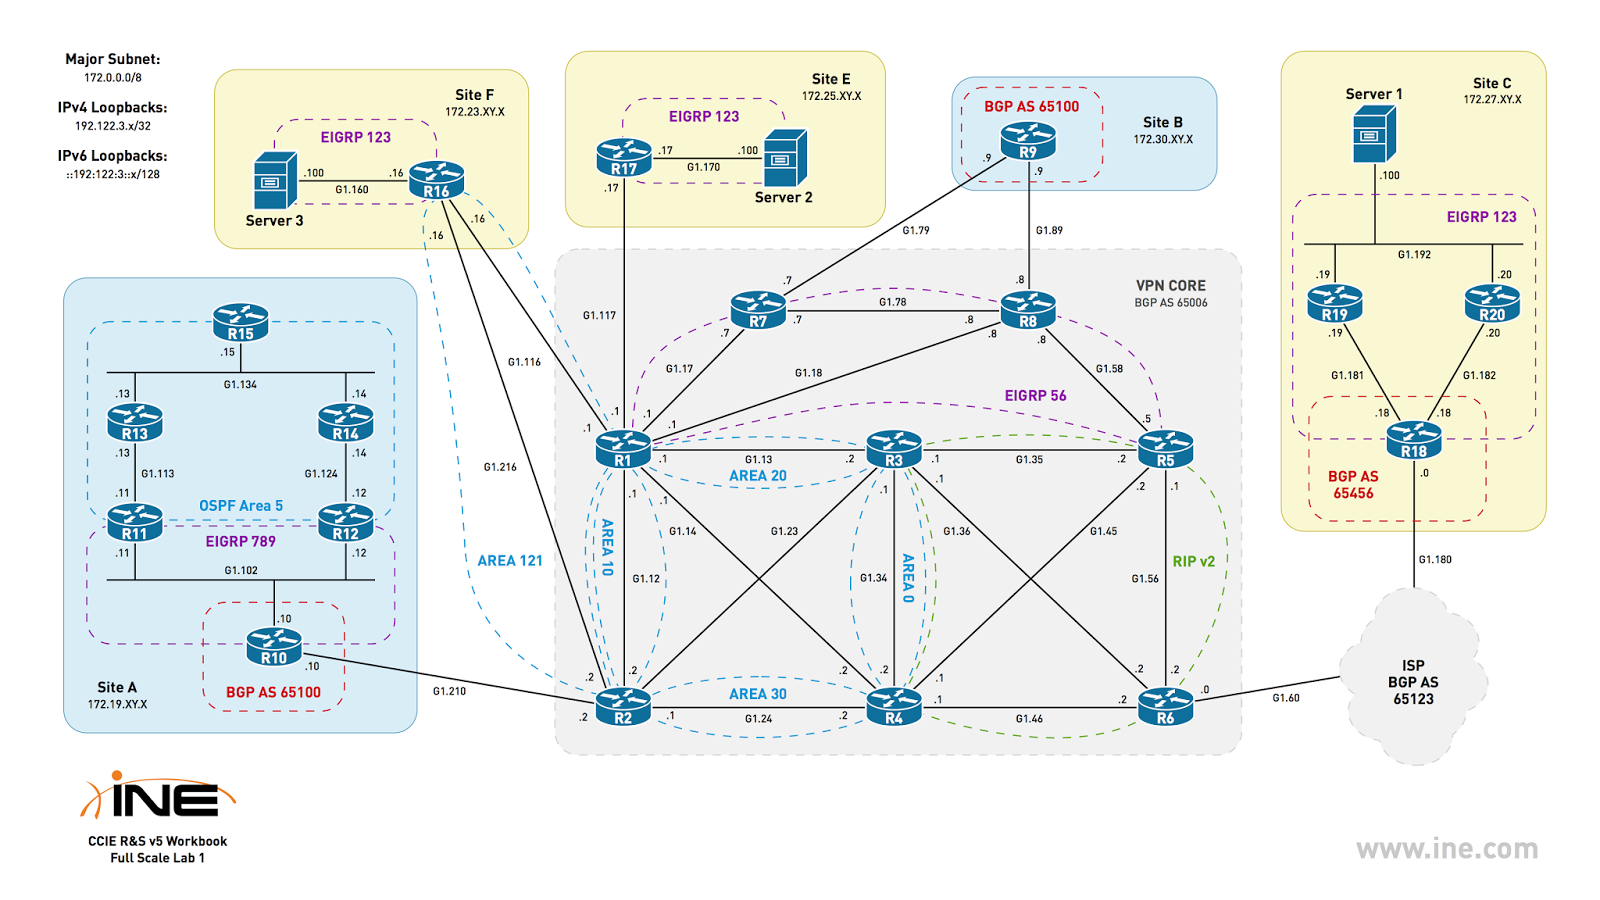 Workbooks ccie workbook : Topology Full Scale CCIE Lab 1 INE version 5 | mynotelab